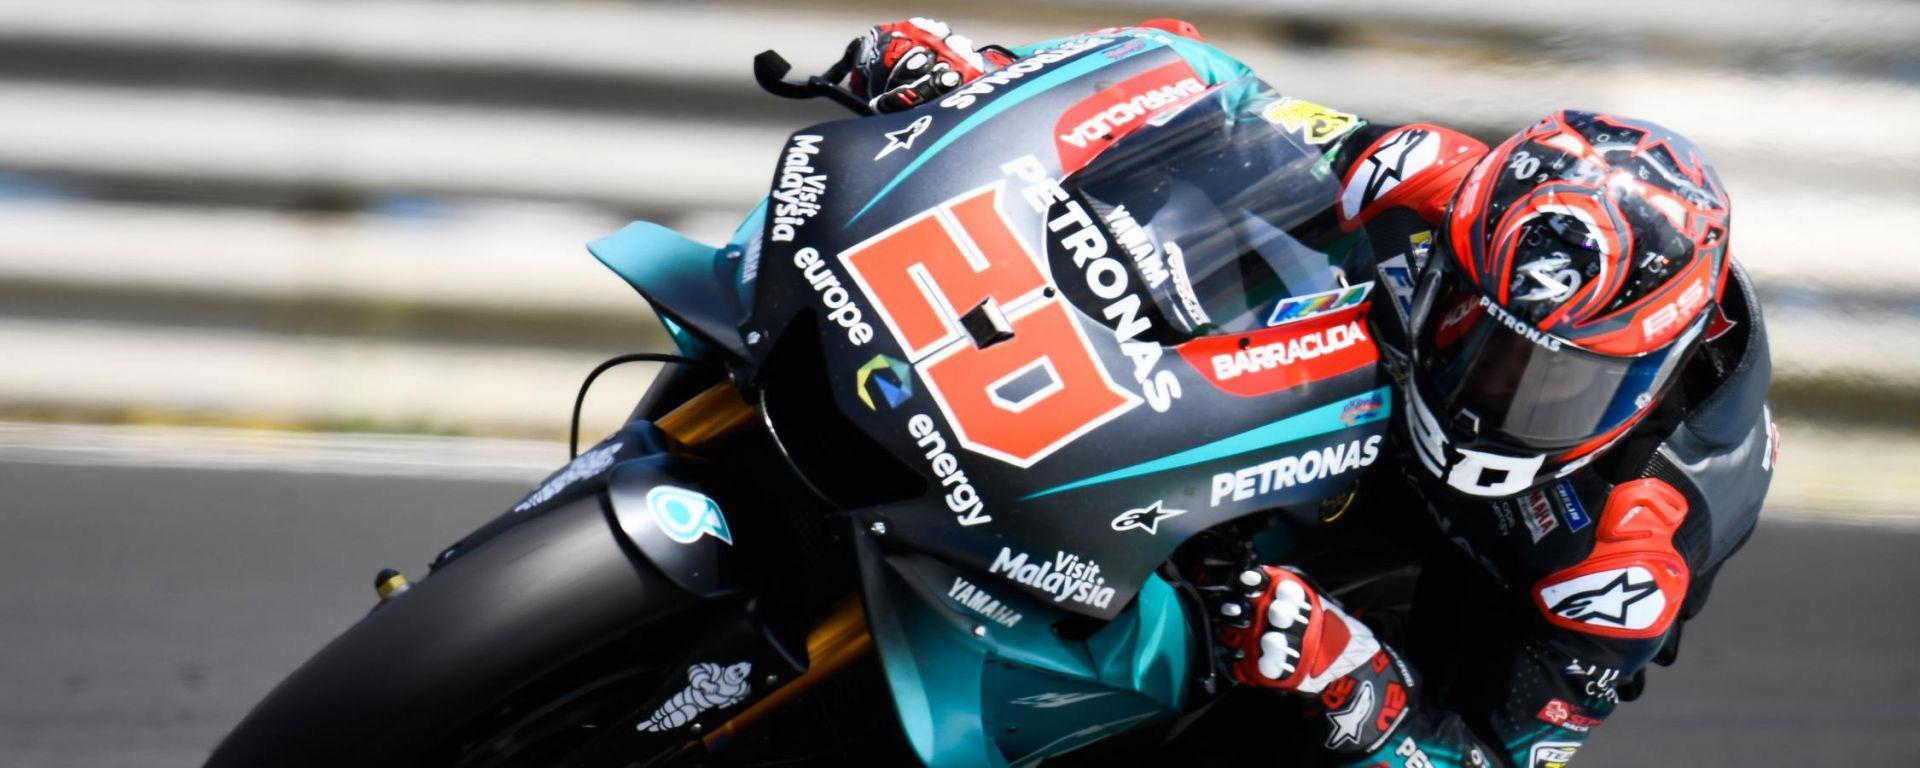 Test Jerez 2019, Fabio Quartararo (Yamaha)